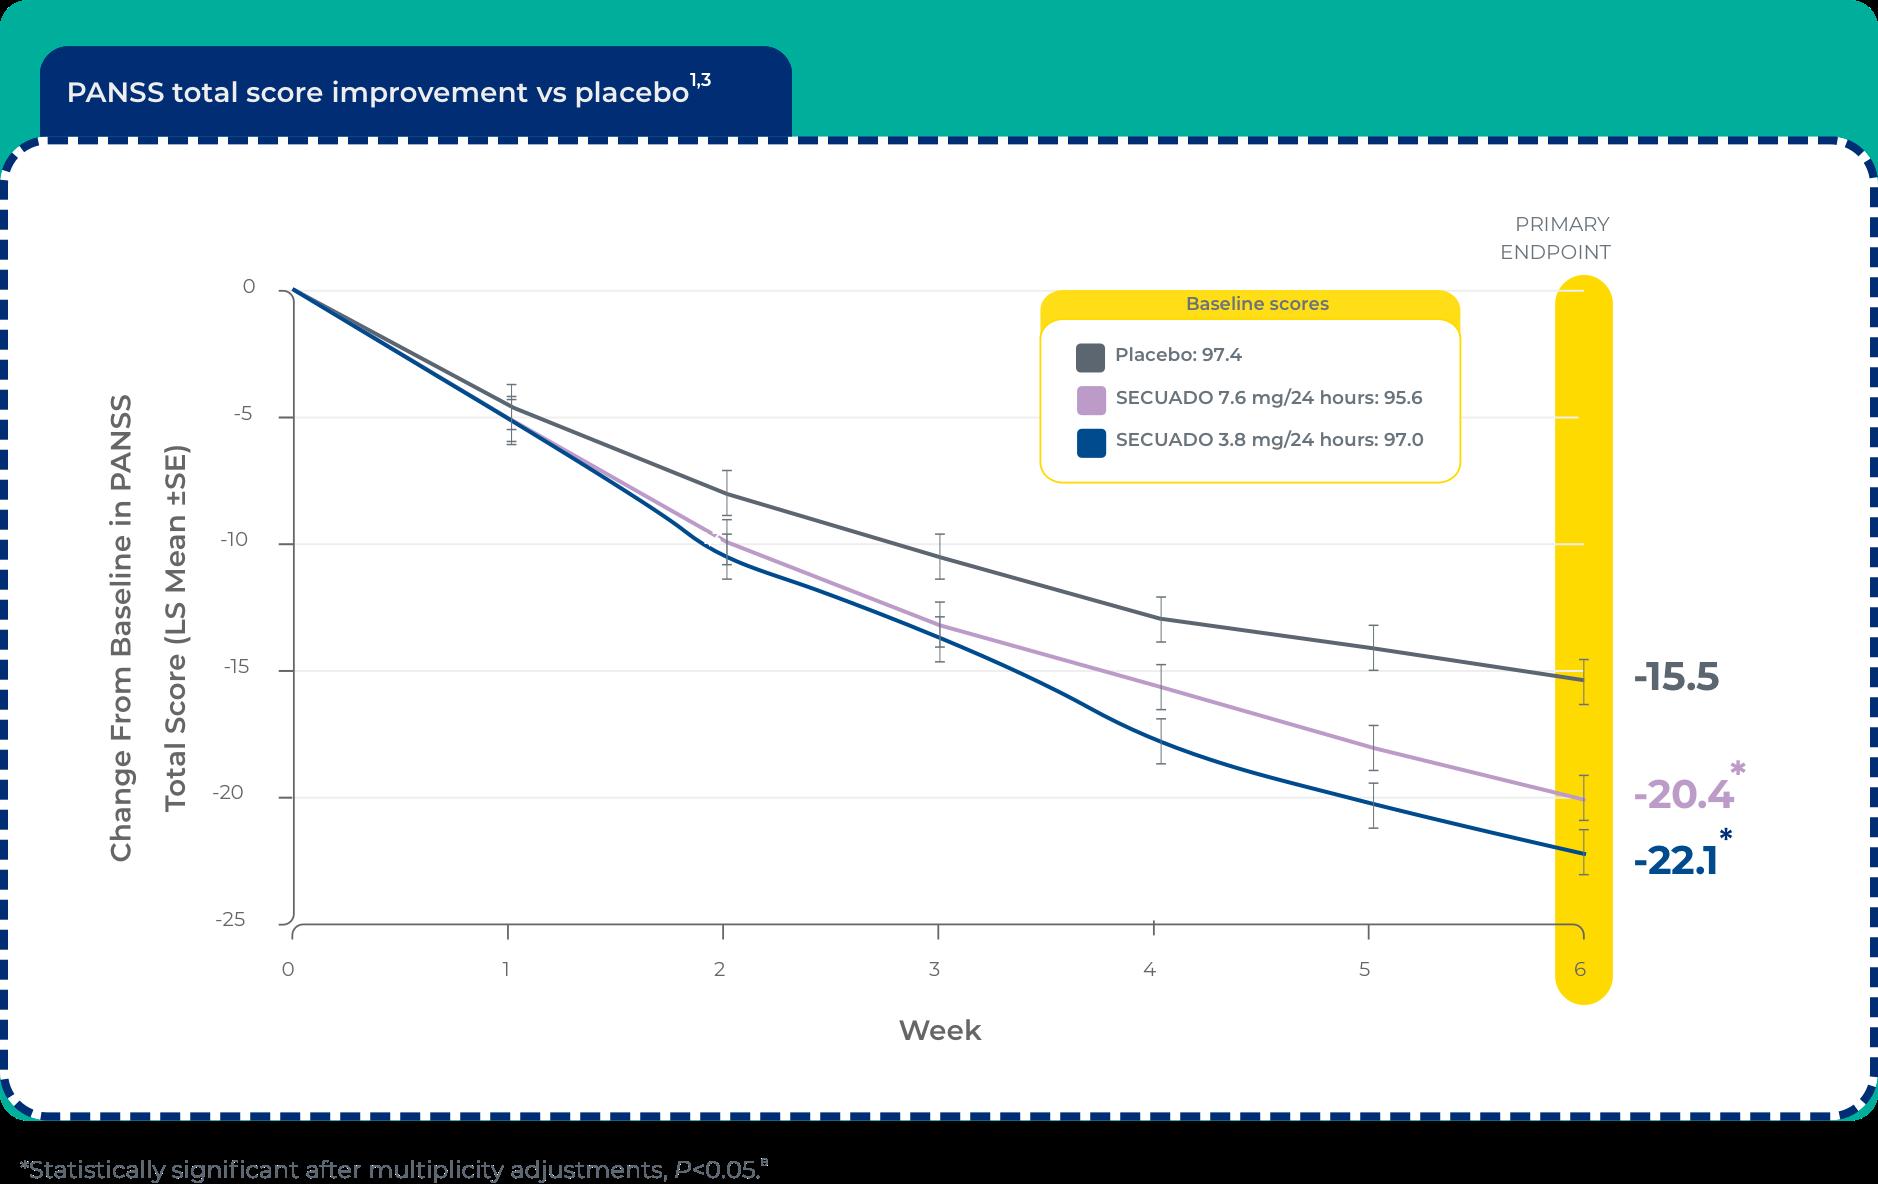 panss total score imorovement vs placebo chart